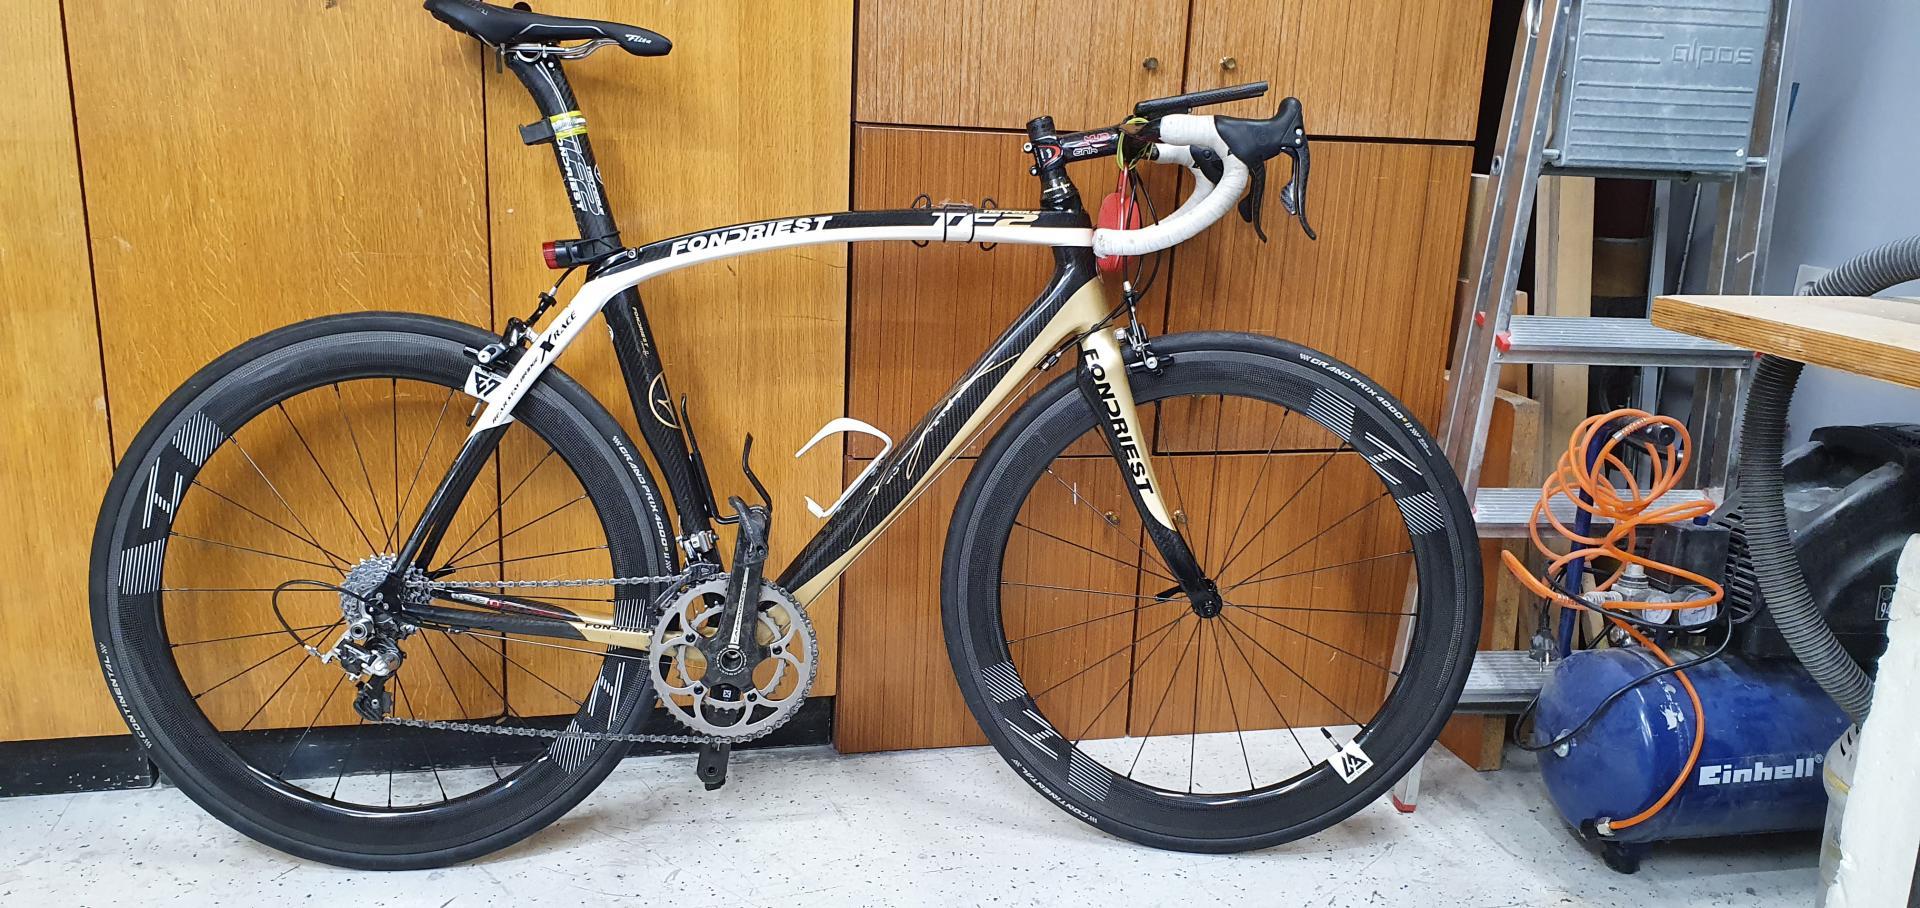 fondriest-tf2-v-brake-frameset-with-light-bicycle-r55-carbon-fiber-wheelset-and-continental-gp4k-ii-tubeless-tires